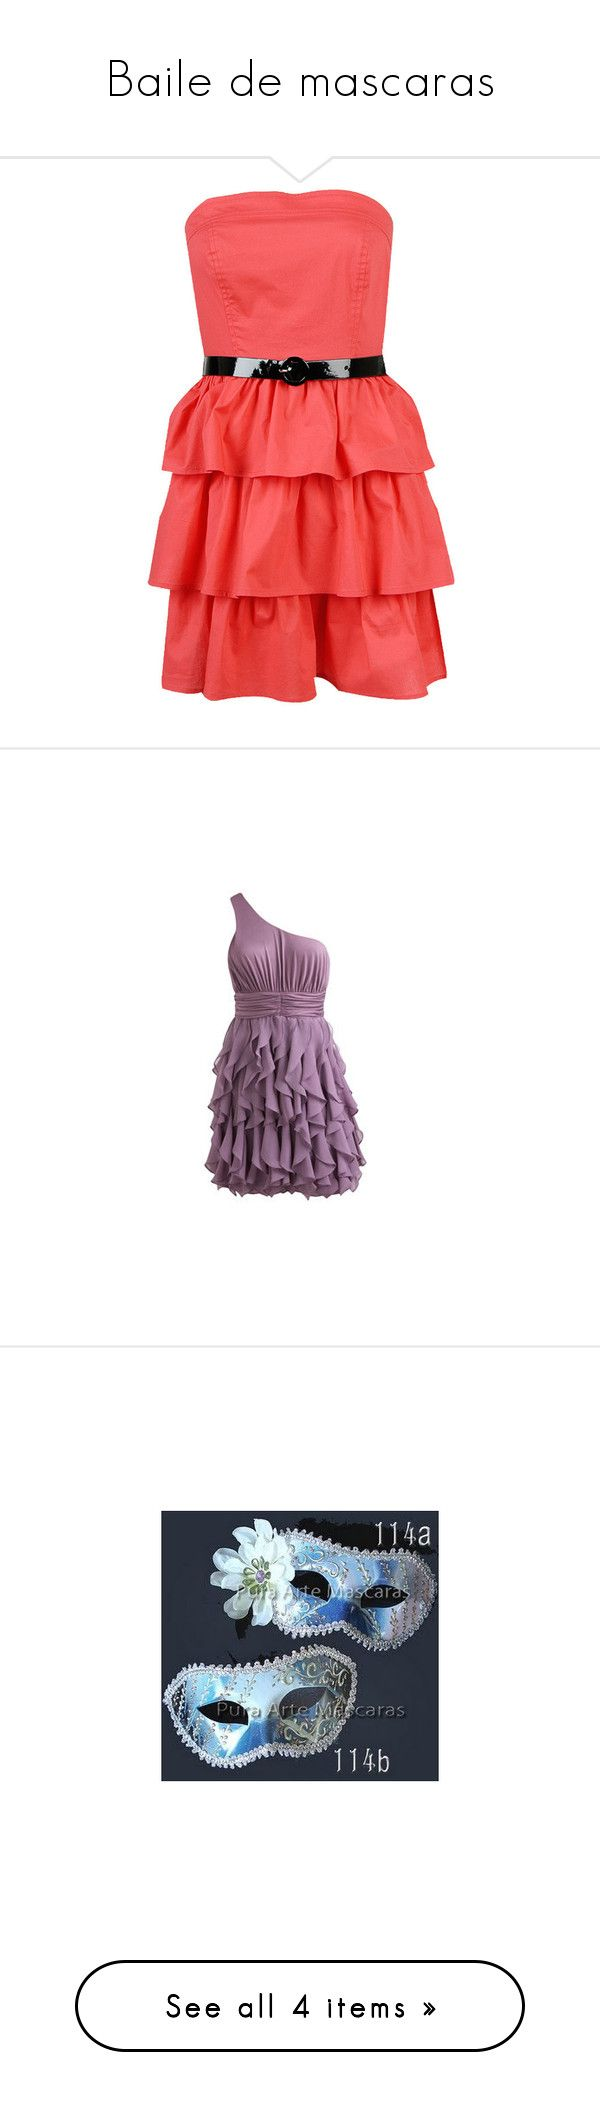 """Baile de mascaras"" by amaya-perez ❤ liked on Polyvore featuring dresses, vestidos, coral, haljine, dressy, short strapless dresses, sexy cocktail dresses, red strapless cocktail dress, sexy short cocktail dresses and red cocktail dress"